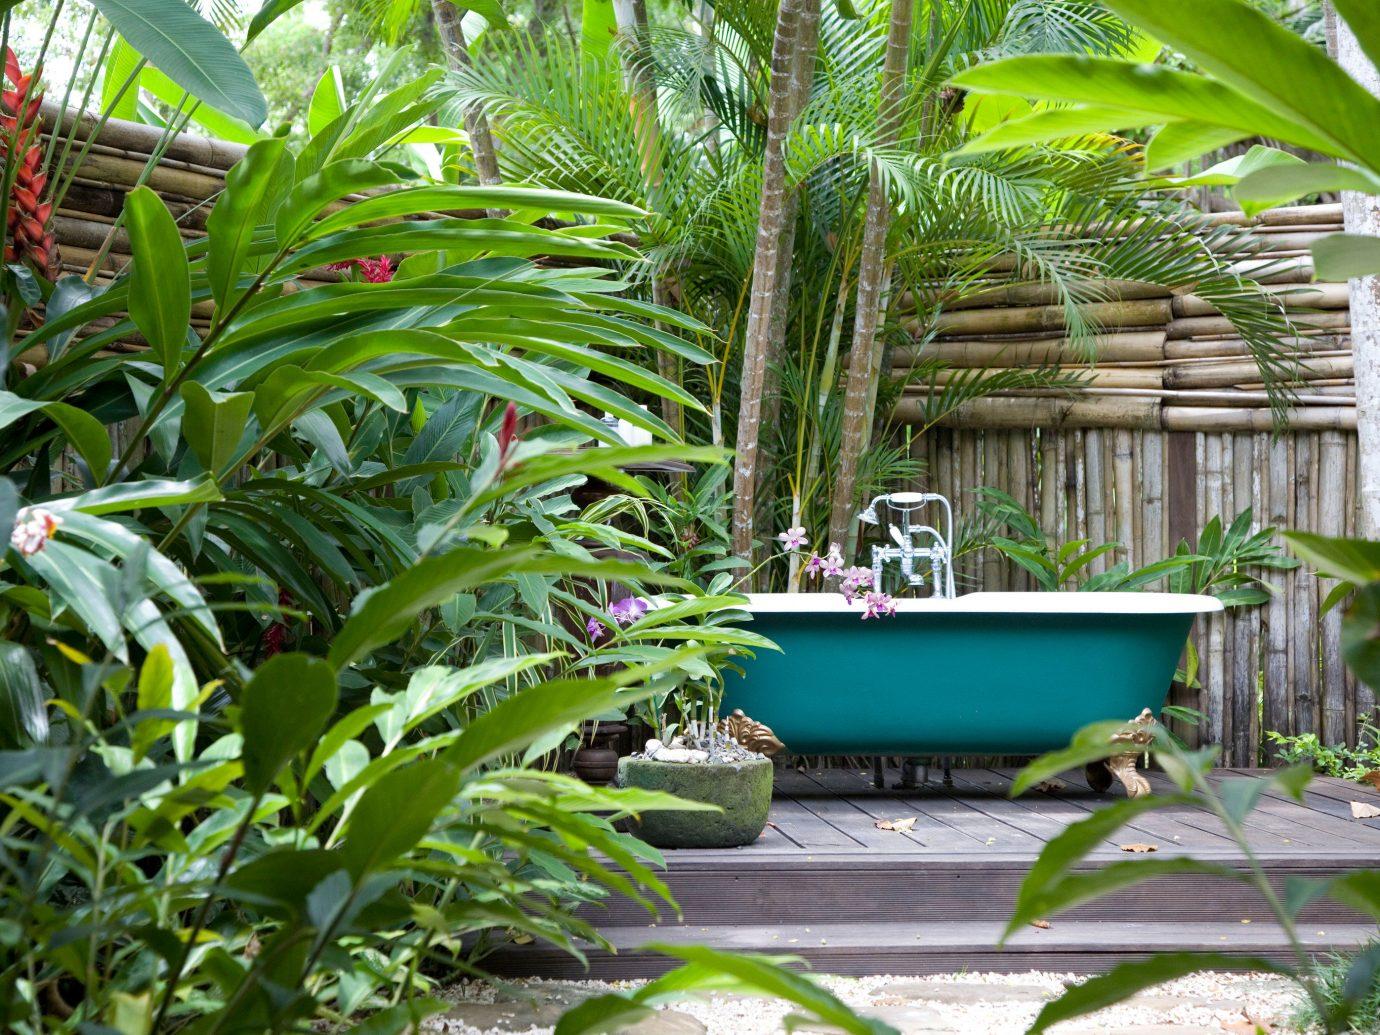 Hotels Luxury Travel plant outdoor palm tree green Garden flora tropics botany flower Jungle rainforest arecales backyard palm family botanical garden Resort yard plantation lawn outdoor structure